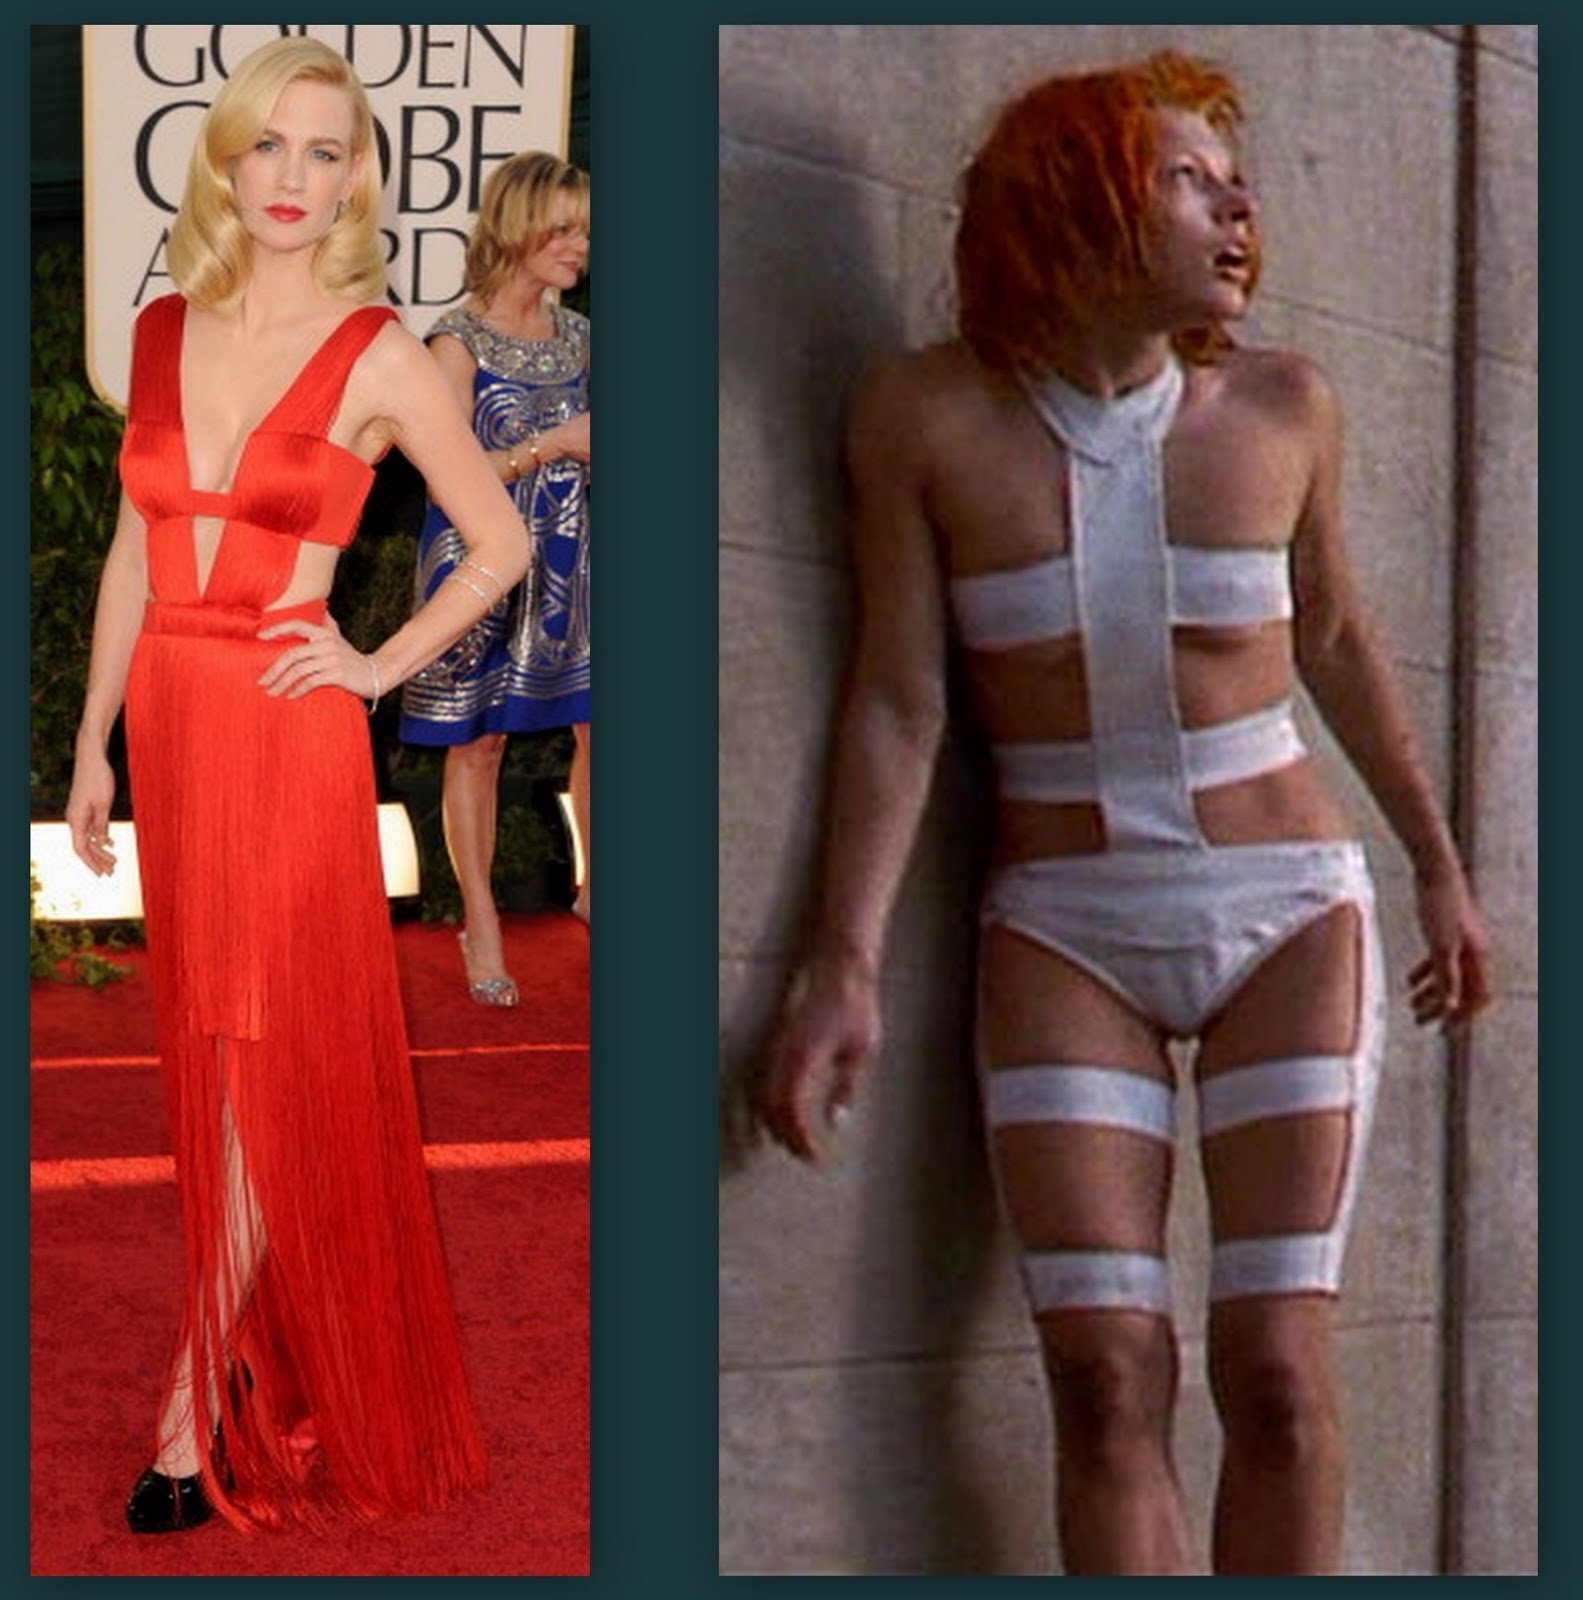 http://2.bp.blogspot.com/_wGl3bmdTX_E/TTVQLI3Wr7I/AAAAAAAAAnQ/IPezU554ZG0/s1600/Dress+Mess8.jpg